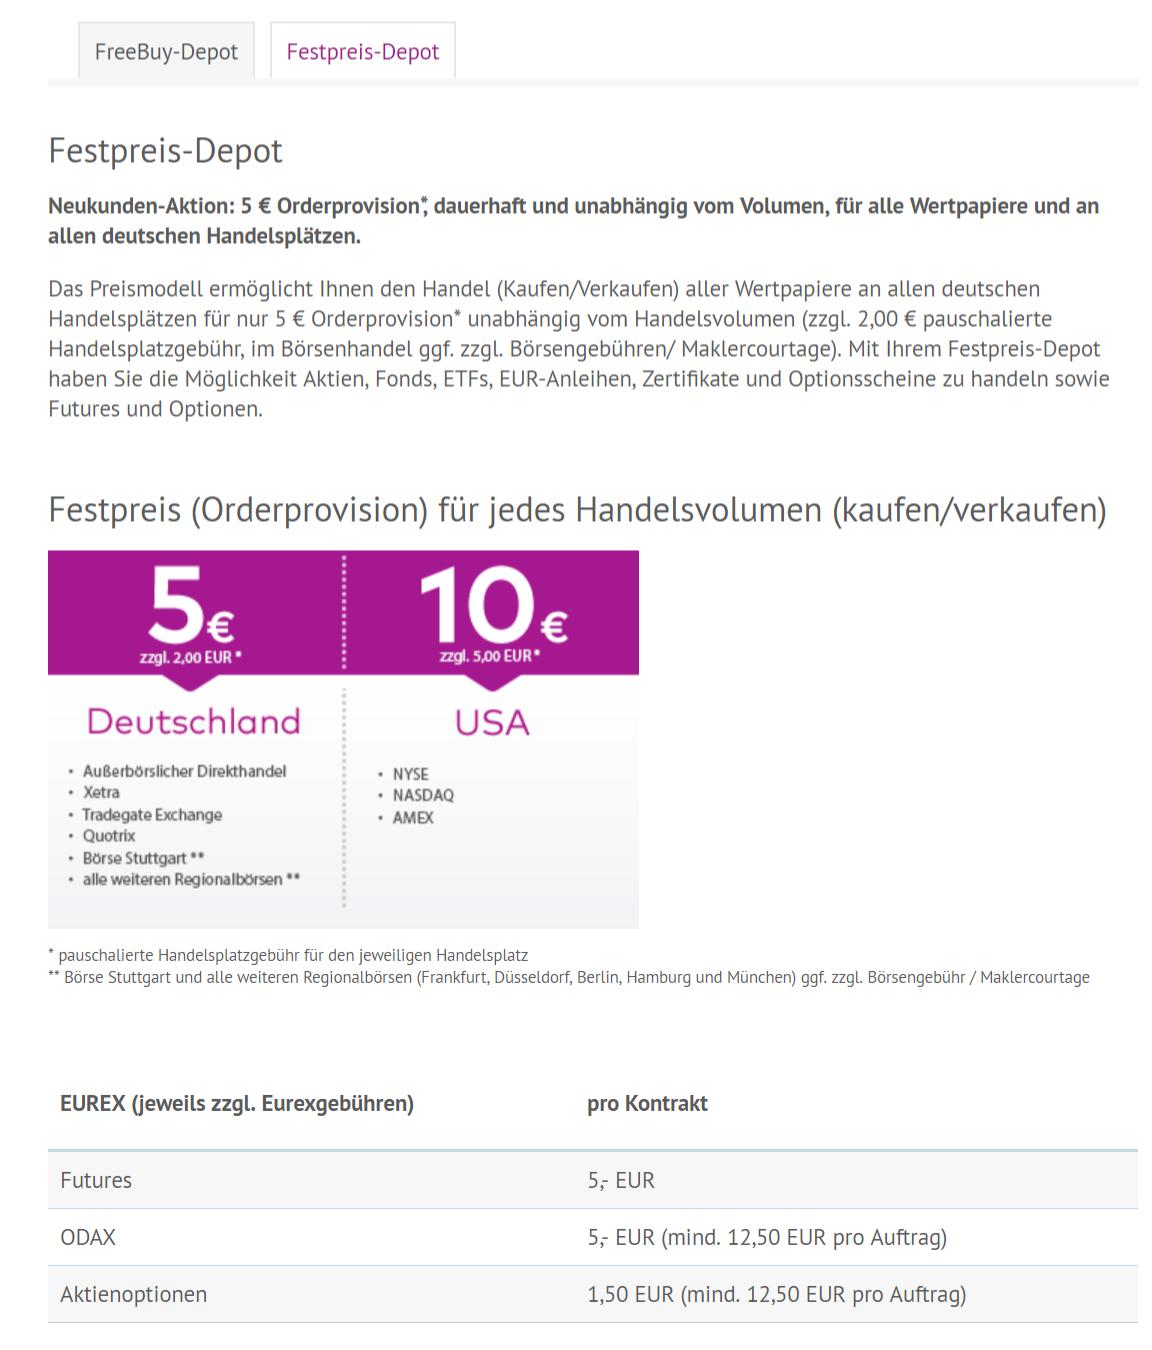 Festpreis-Depot_Uebersicht